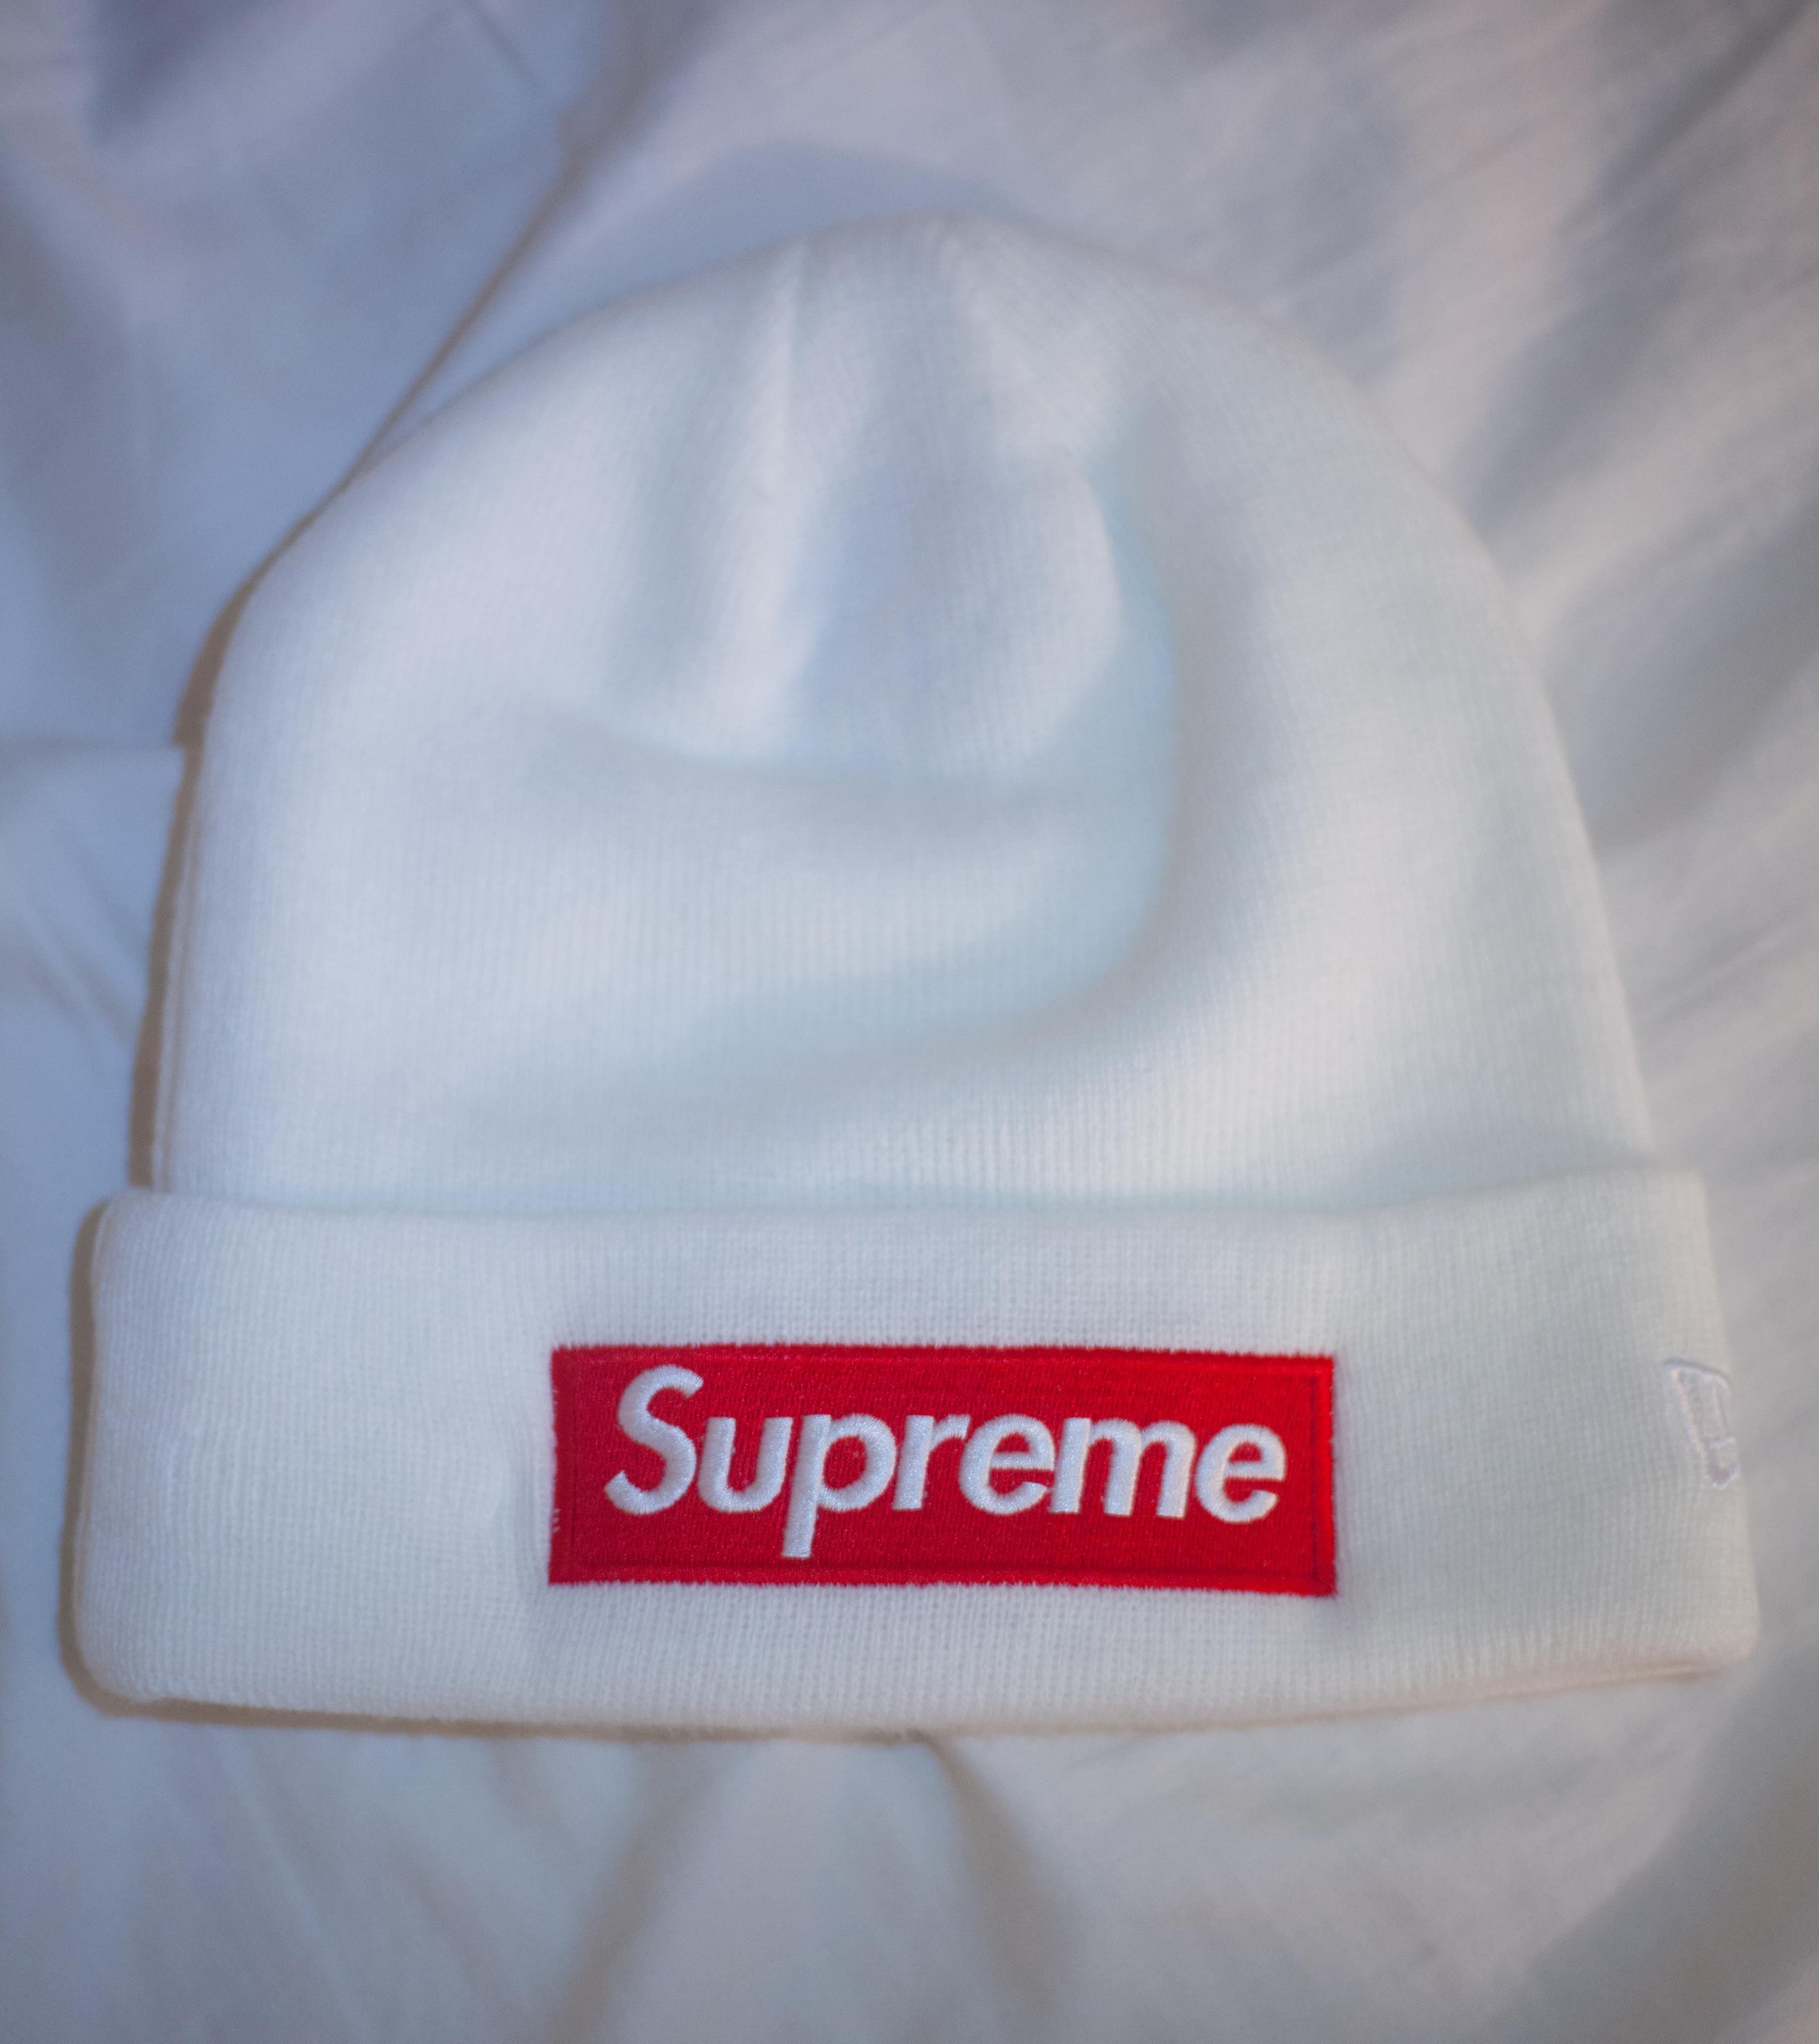 bb704ad6dde Supreme FW16 Box Logo Beanie (Red Box   White Beanie) Size one size - Hats  for Sale - Grailed